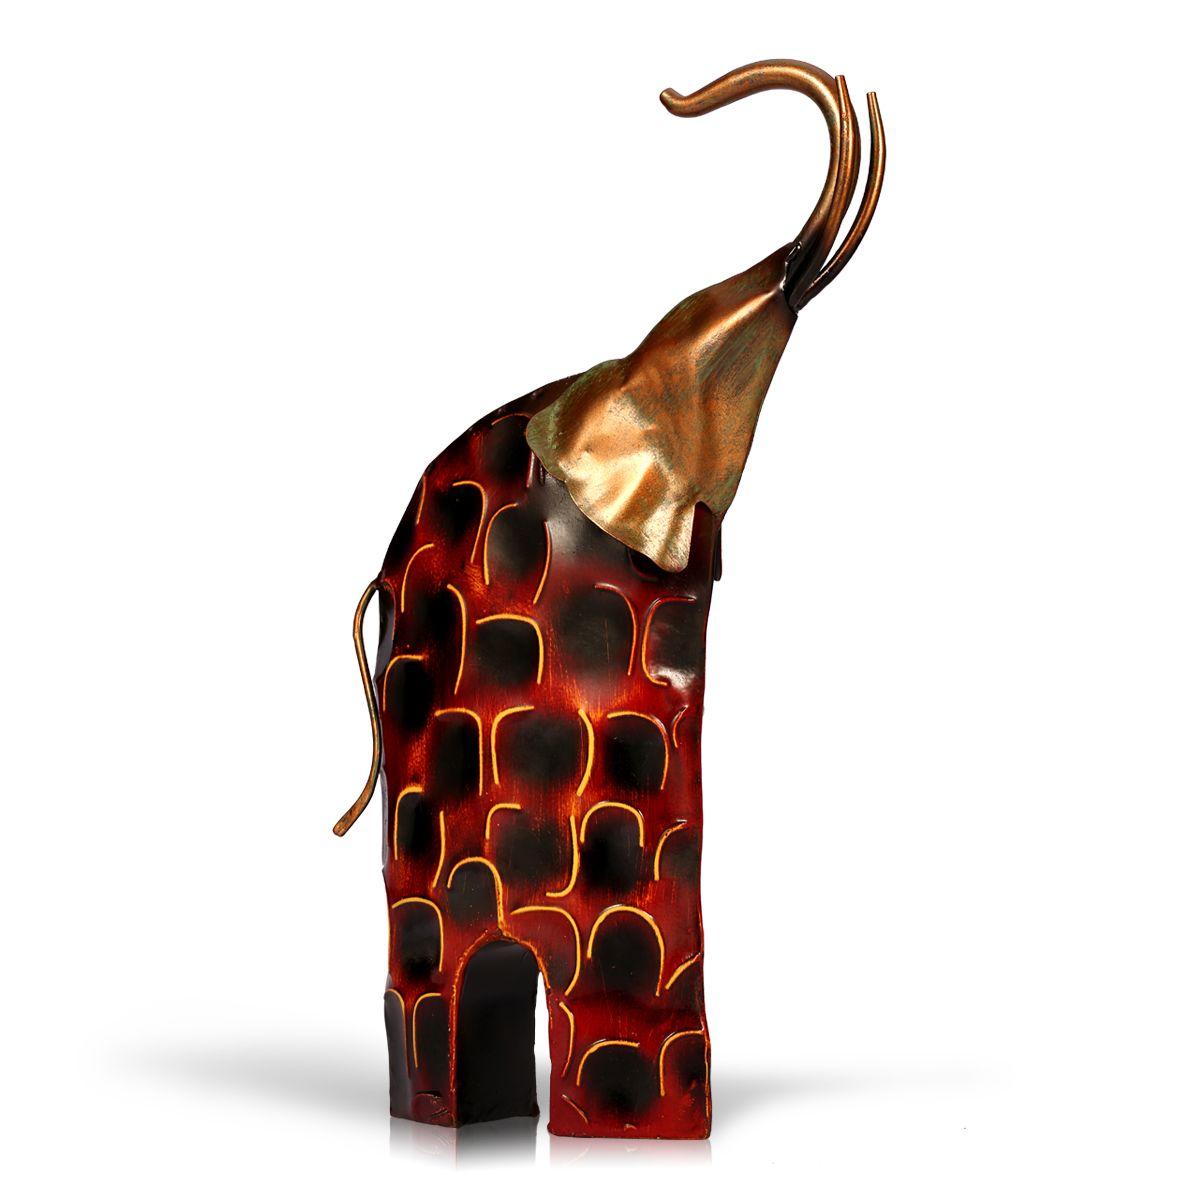 TOOARTS Metal Sculpture Raising Head Iron Art Elephant Home Furnishing Articles